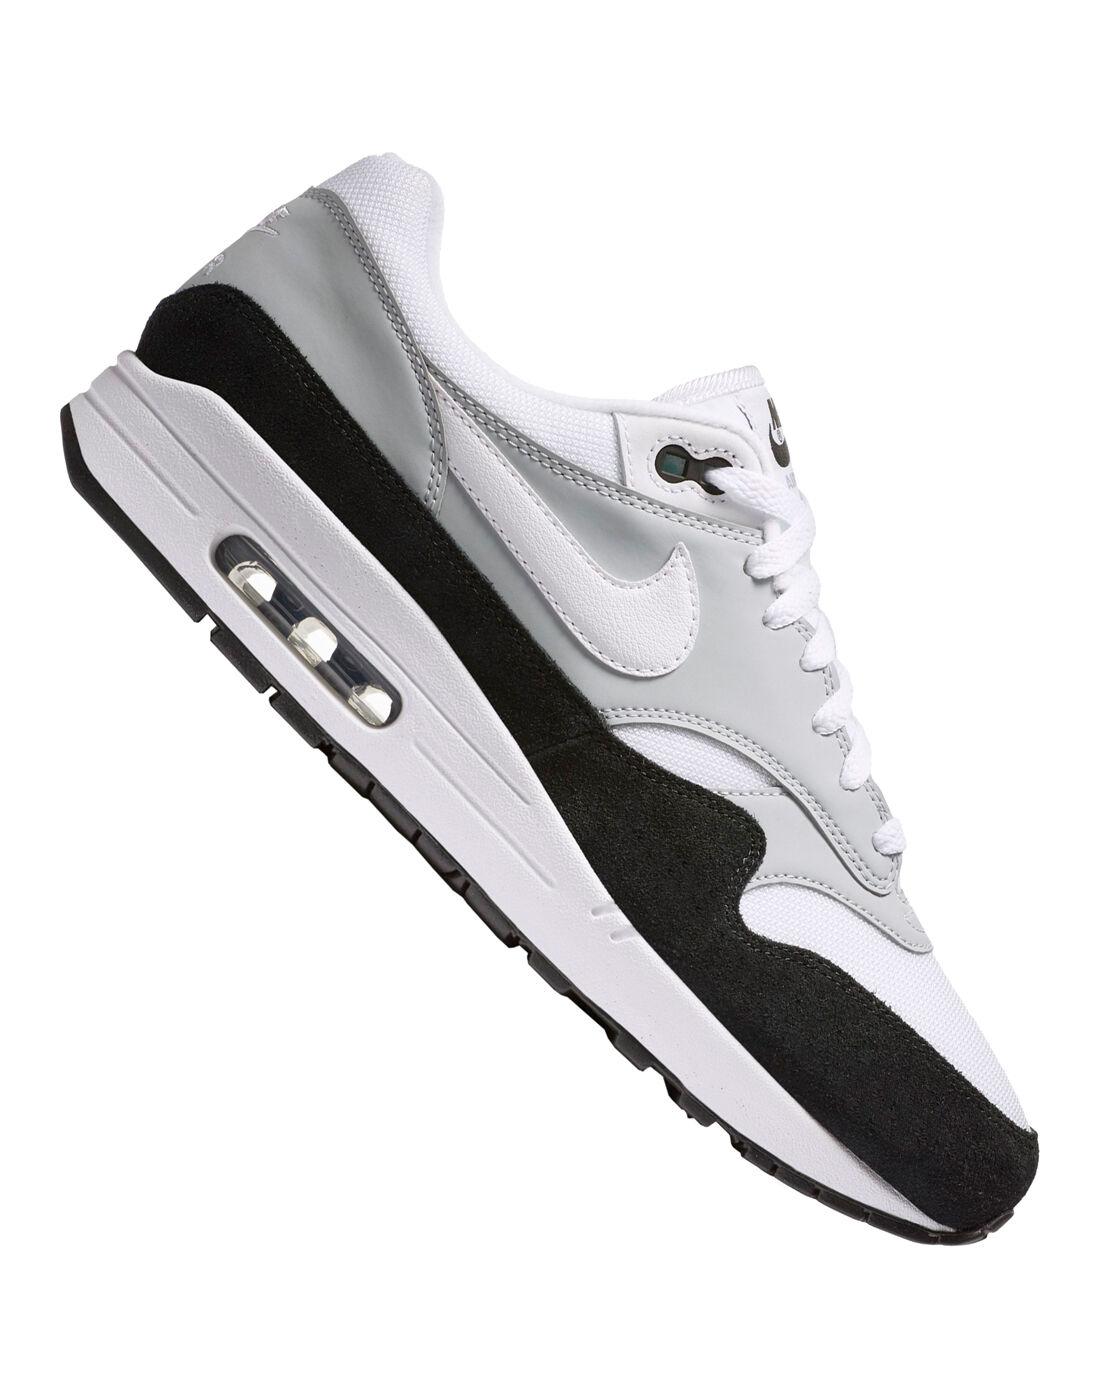 Men's Nike Air Max 1   White & Black   Life Style Sports